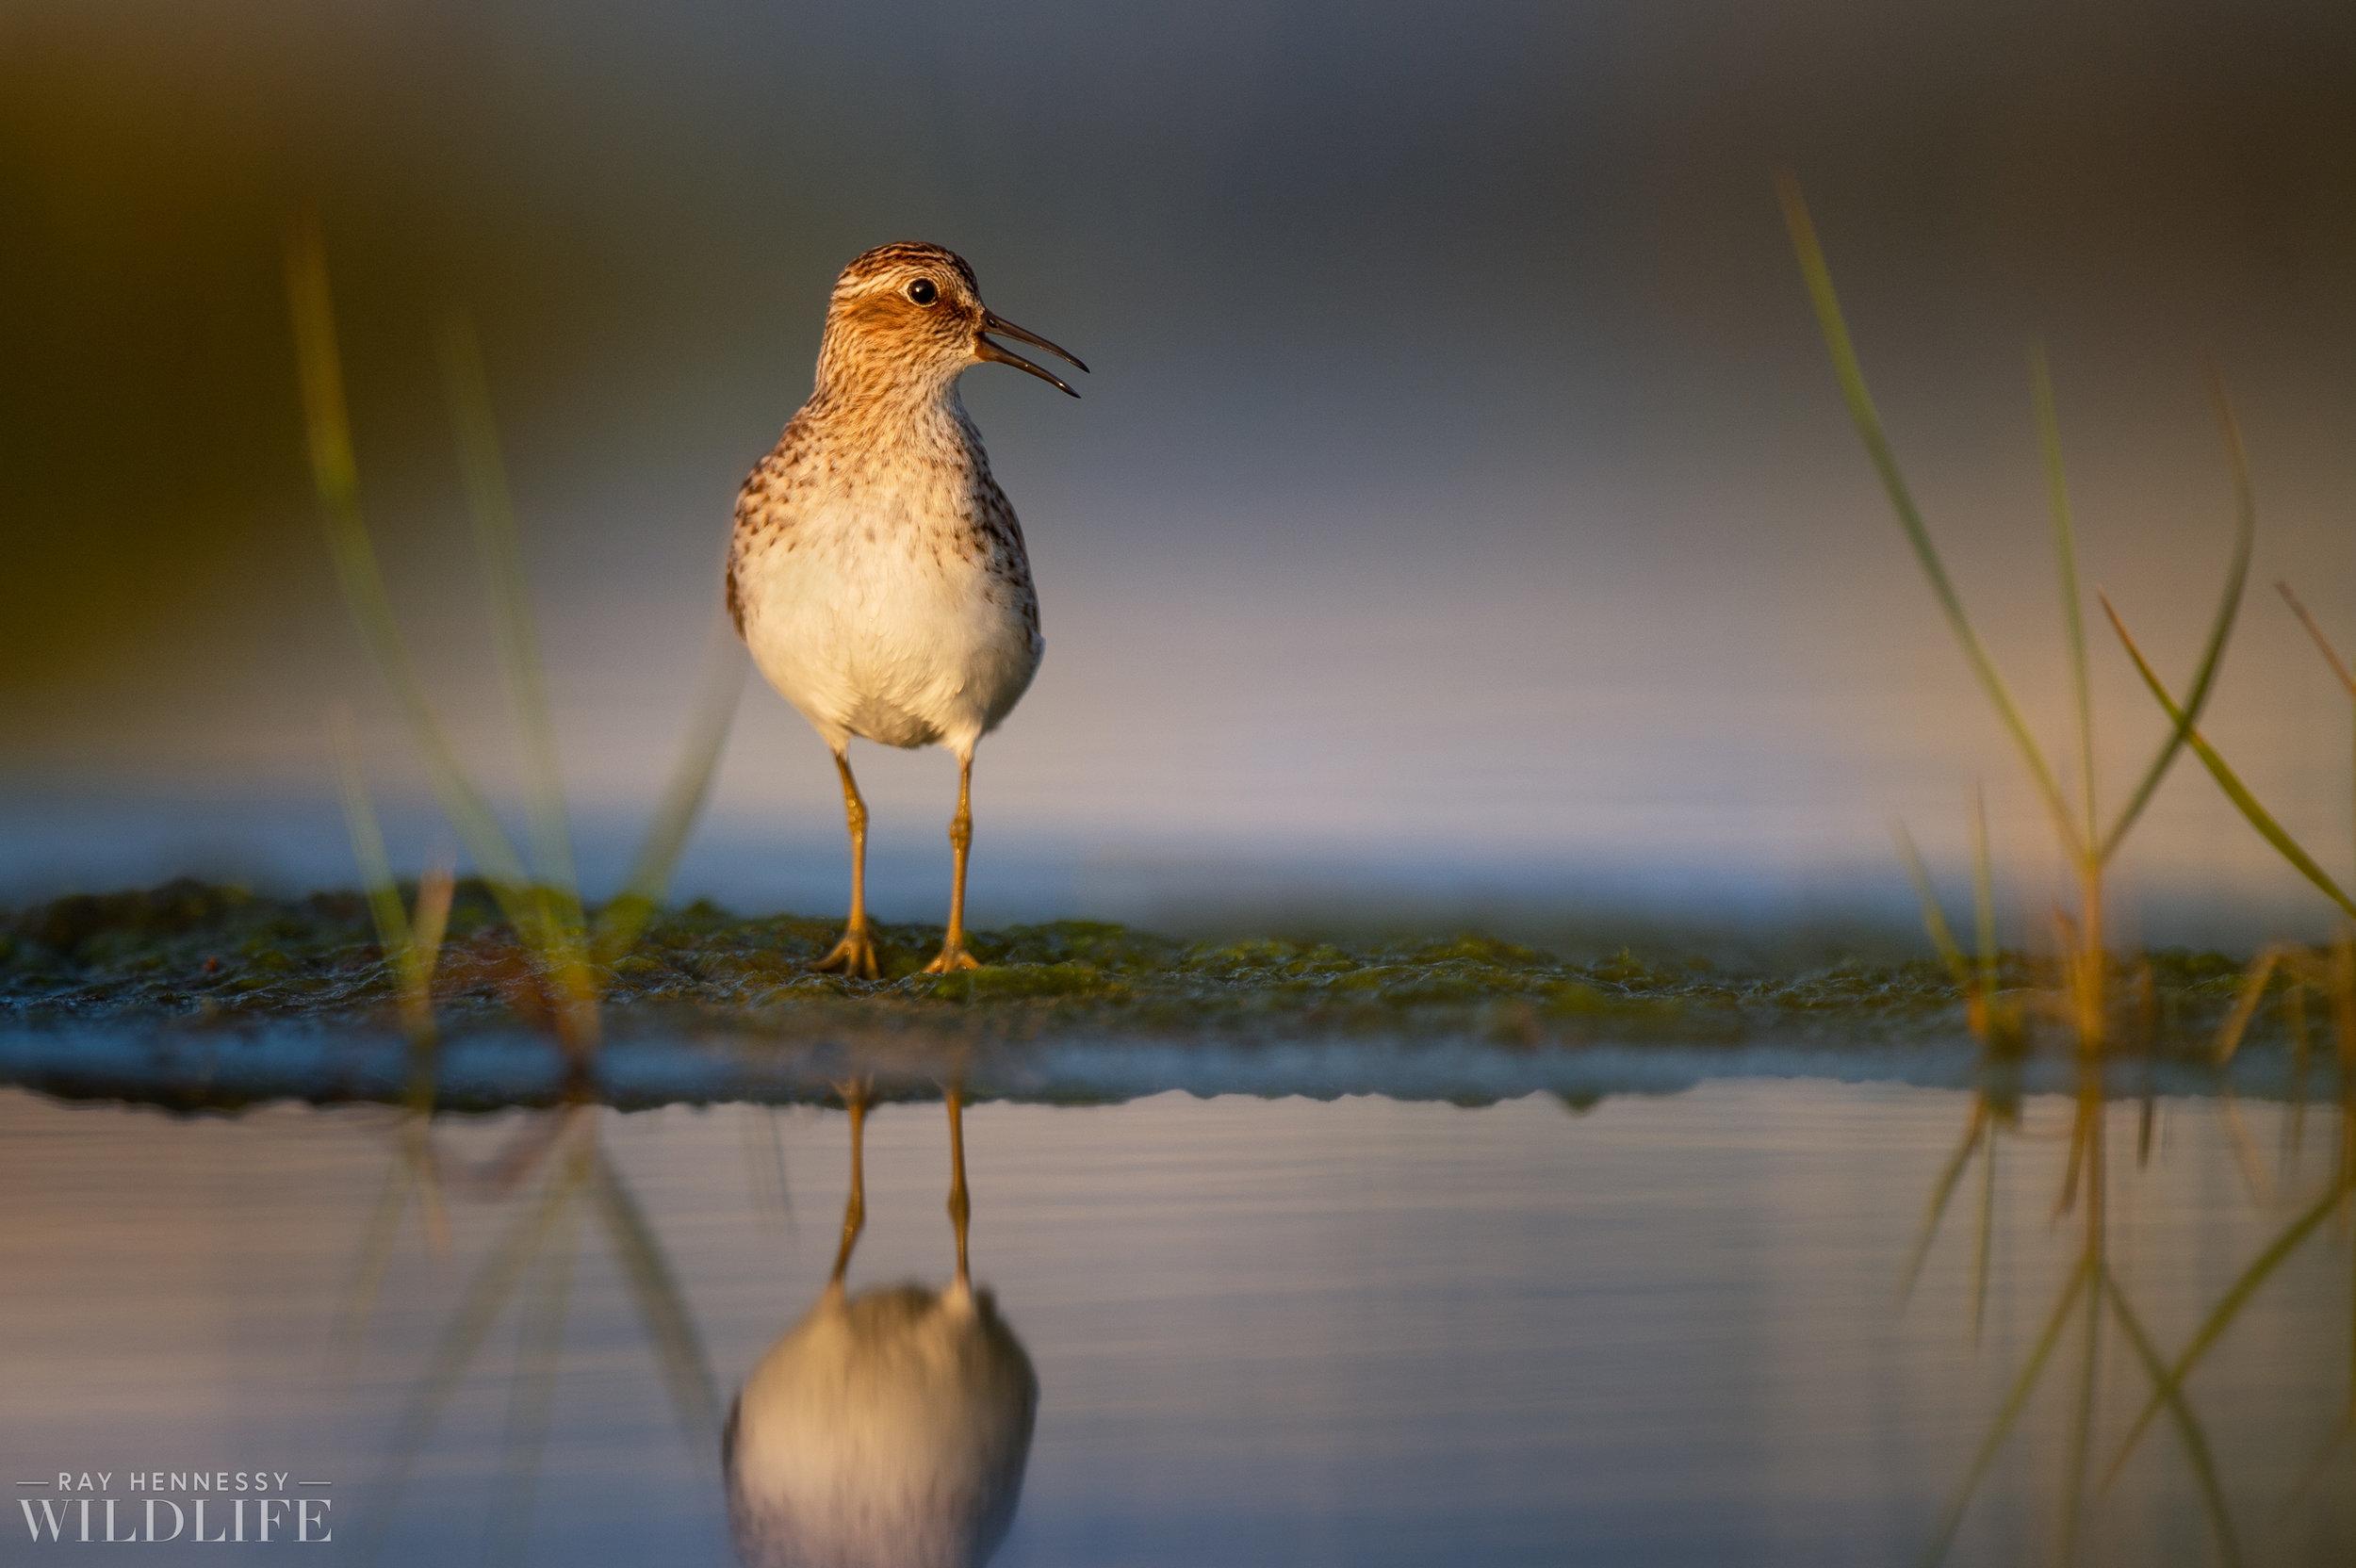 006_shorebirds-prothonotary-warbler.jpg